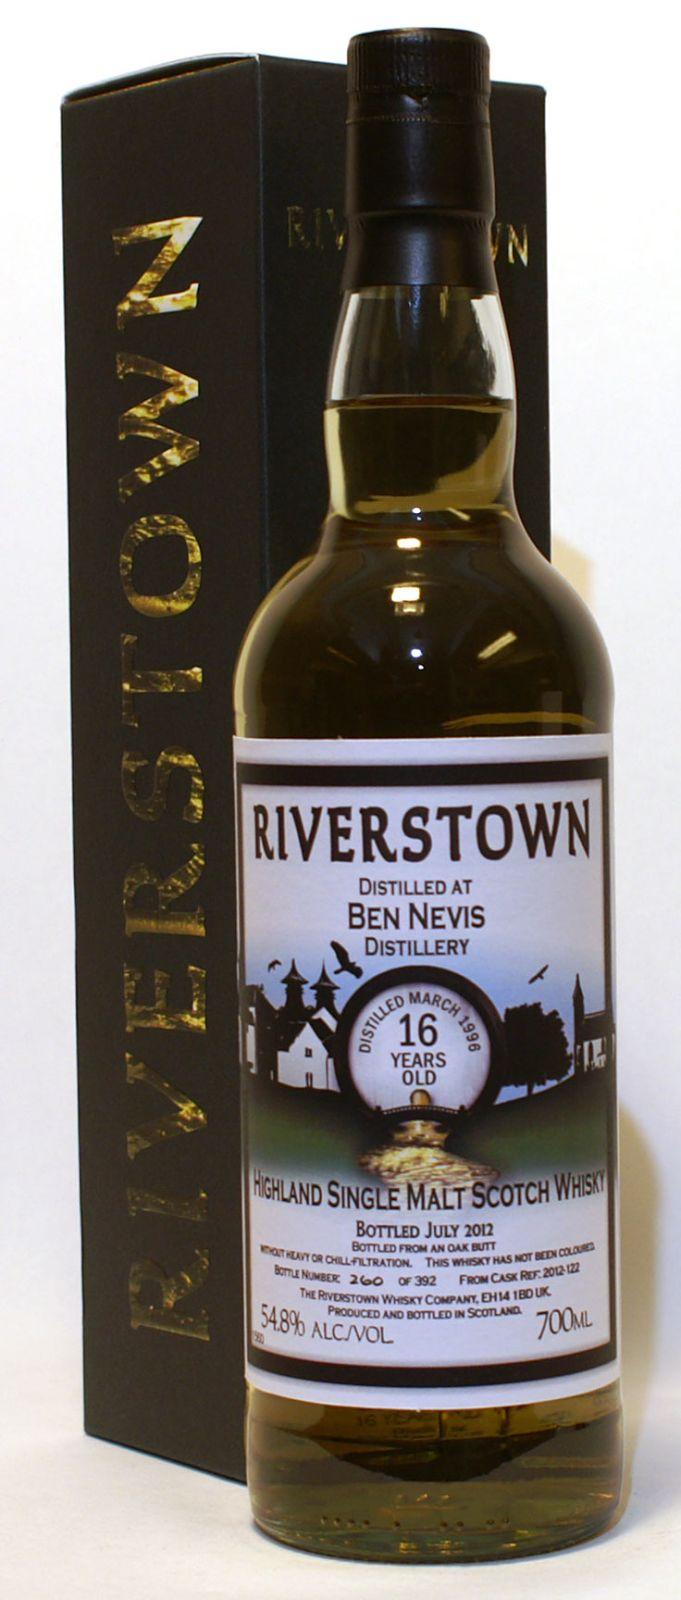 The Whisky Viking: Ben Nevis 16 yo (1996/2012), Riverstown, 54,8 %